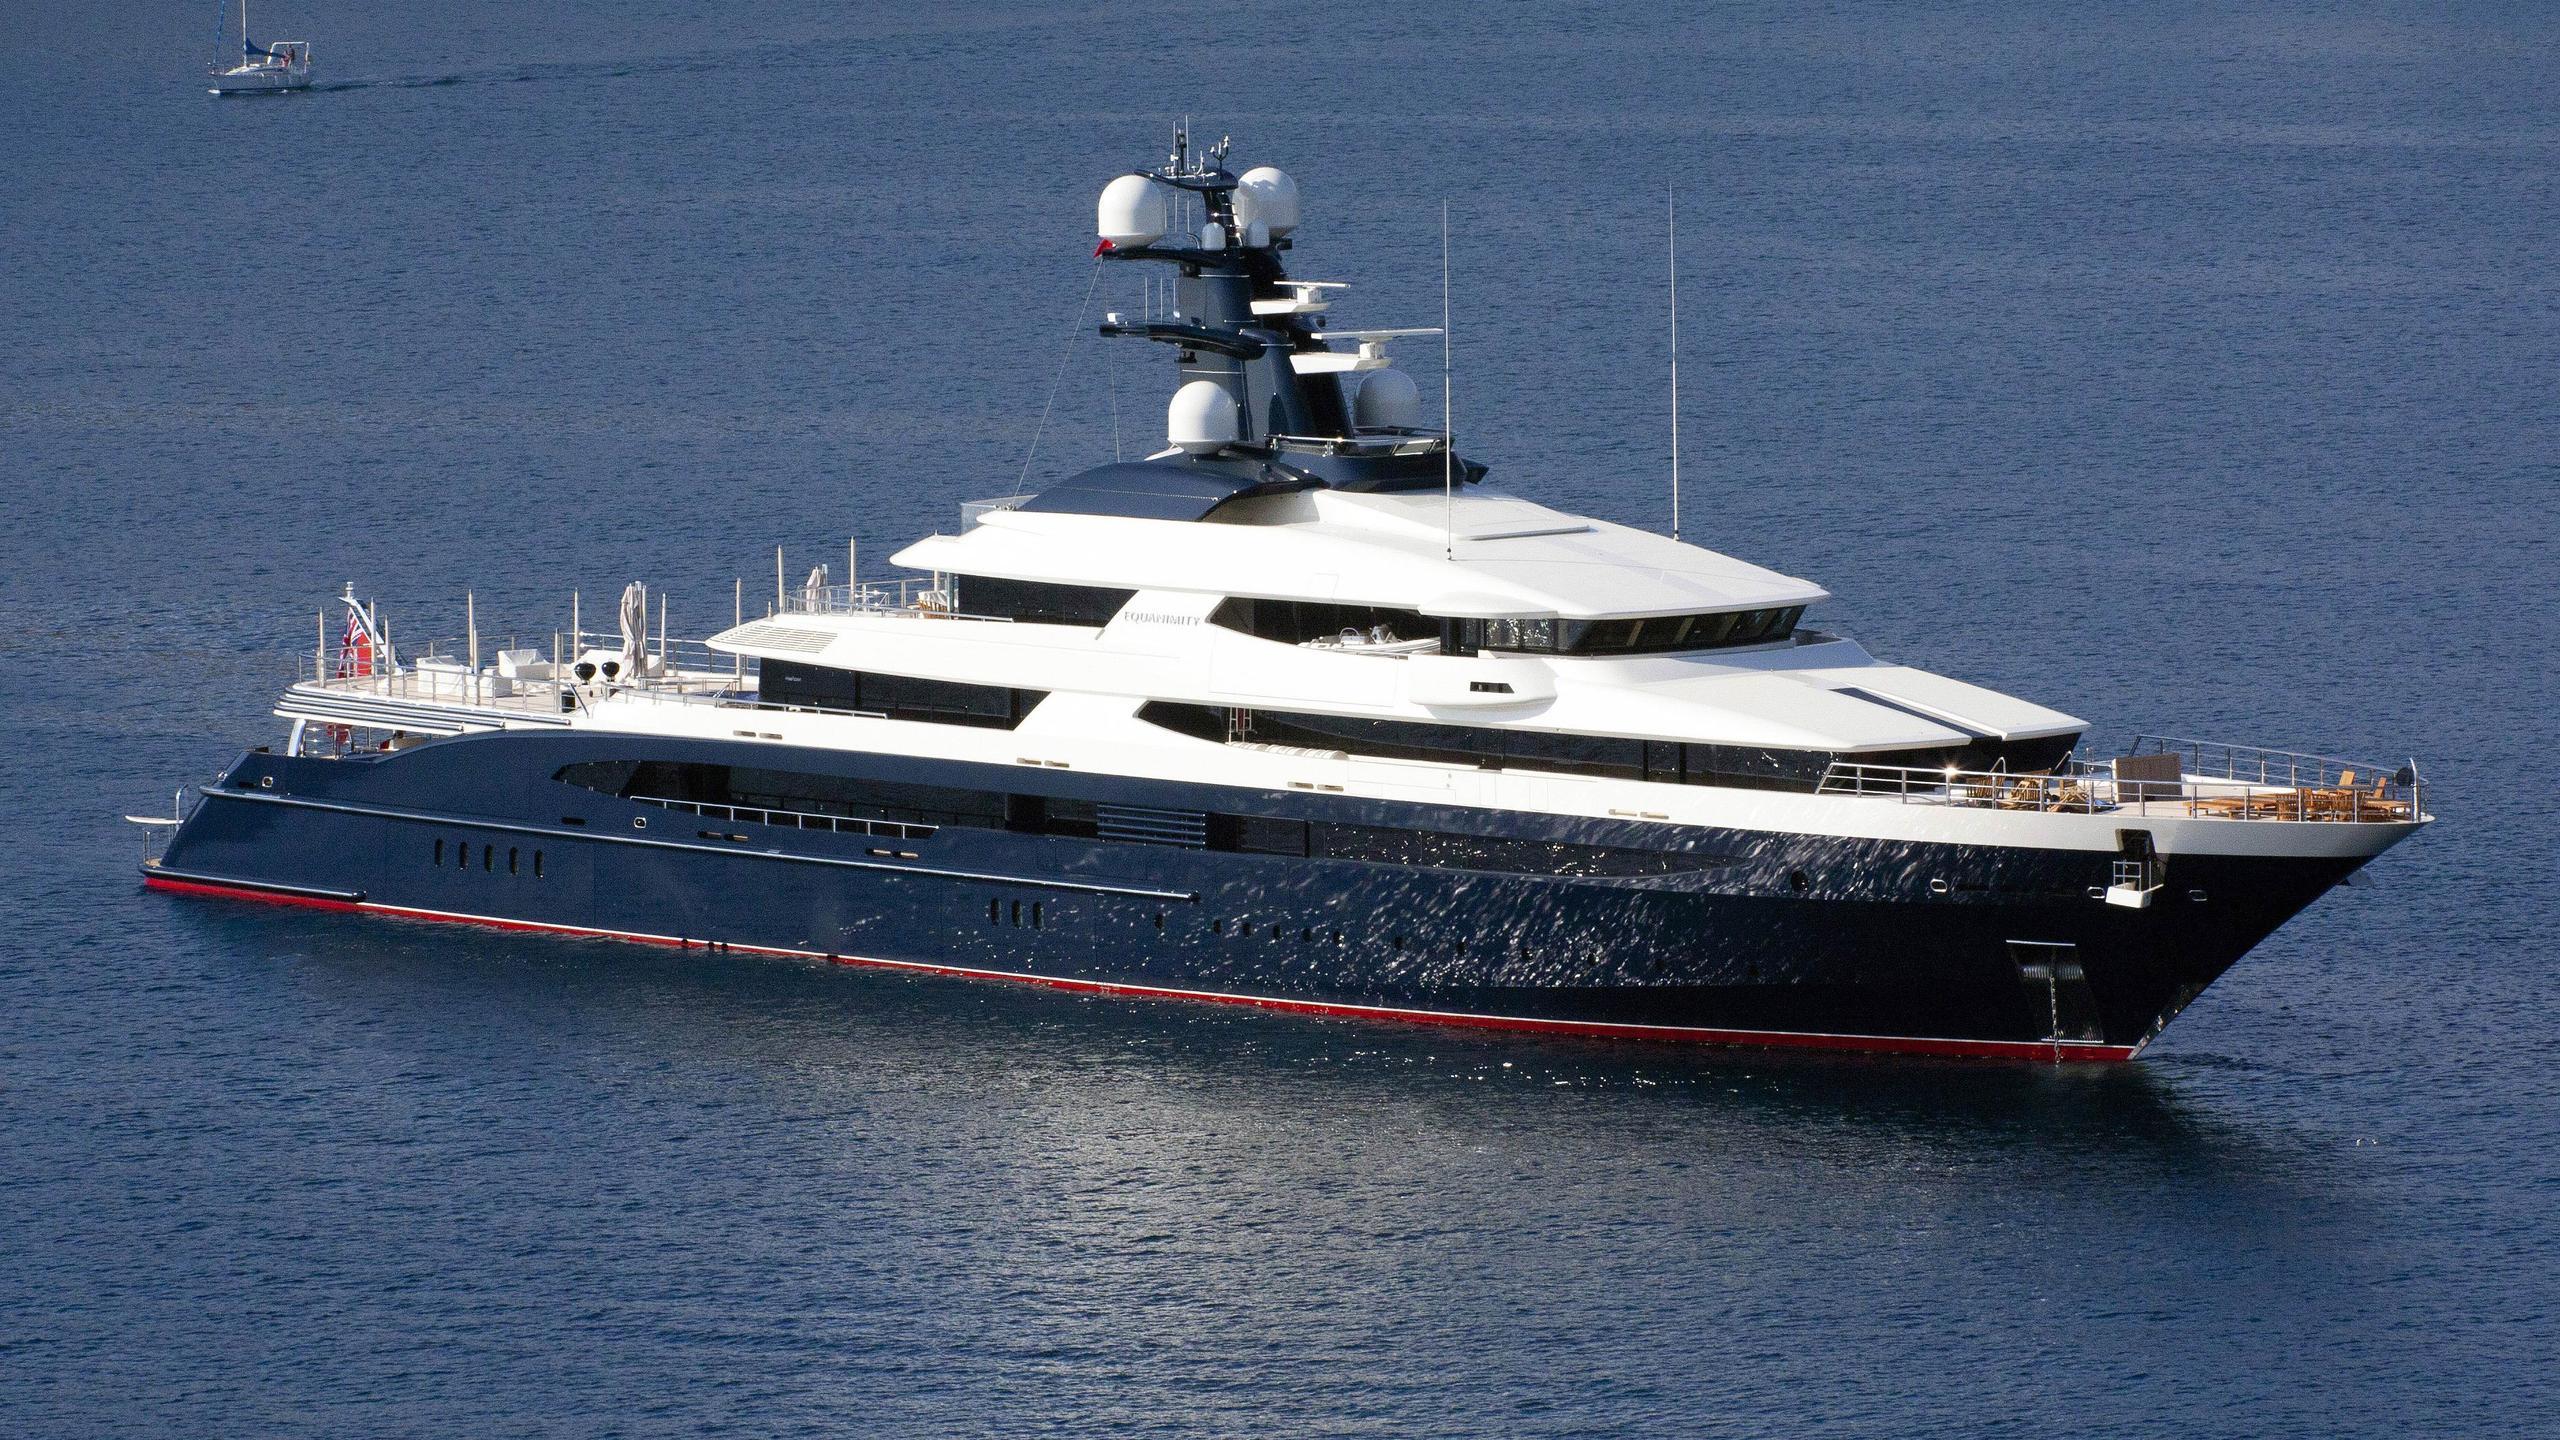 equanimity-explorer-yacht-2014-91m-half-profile